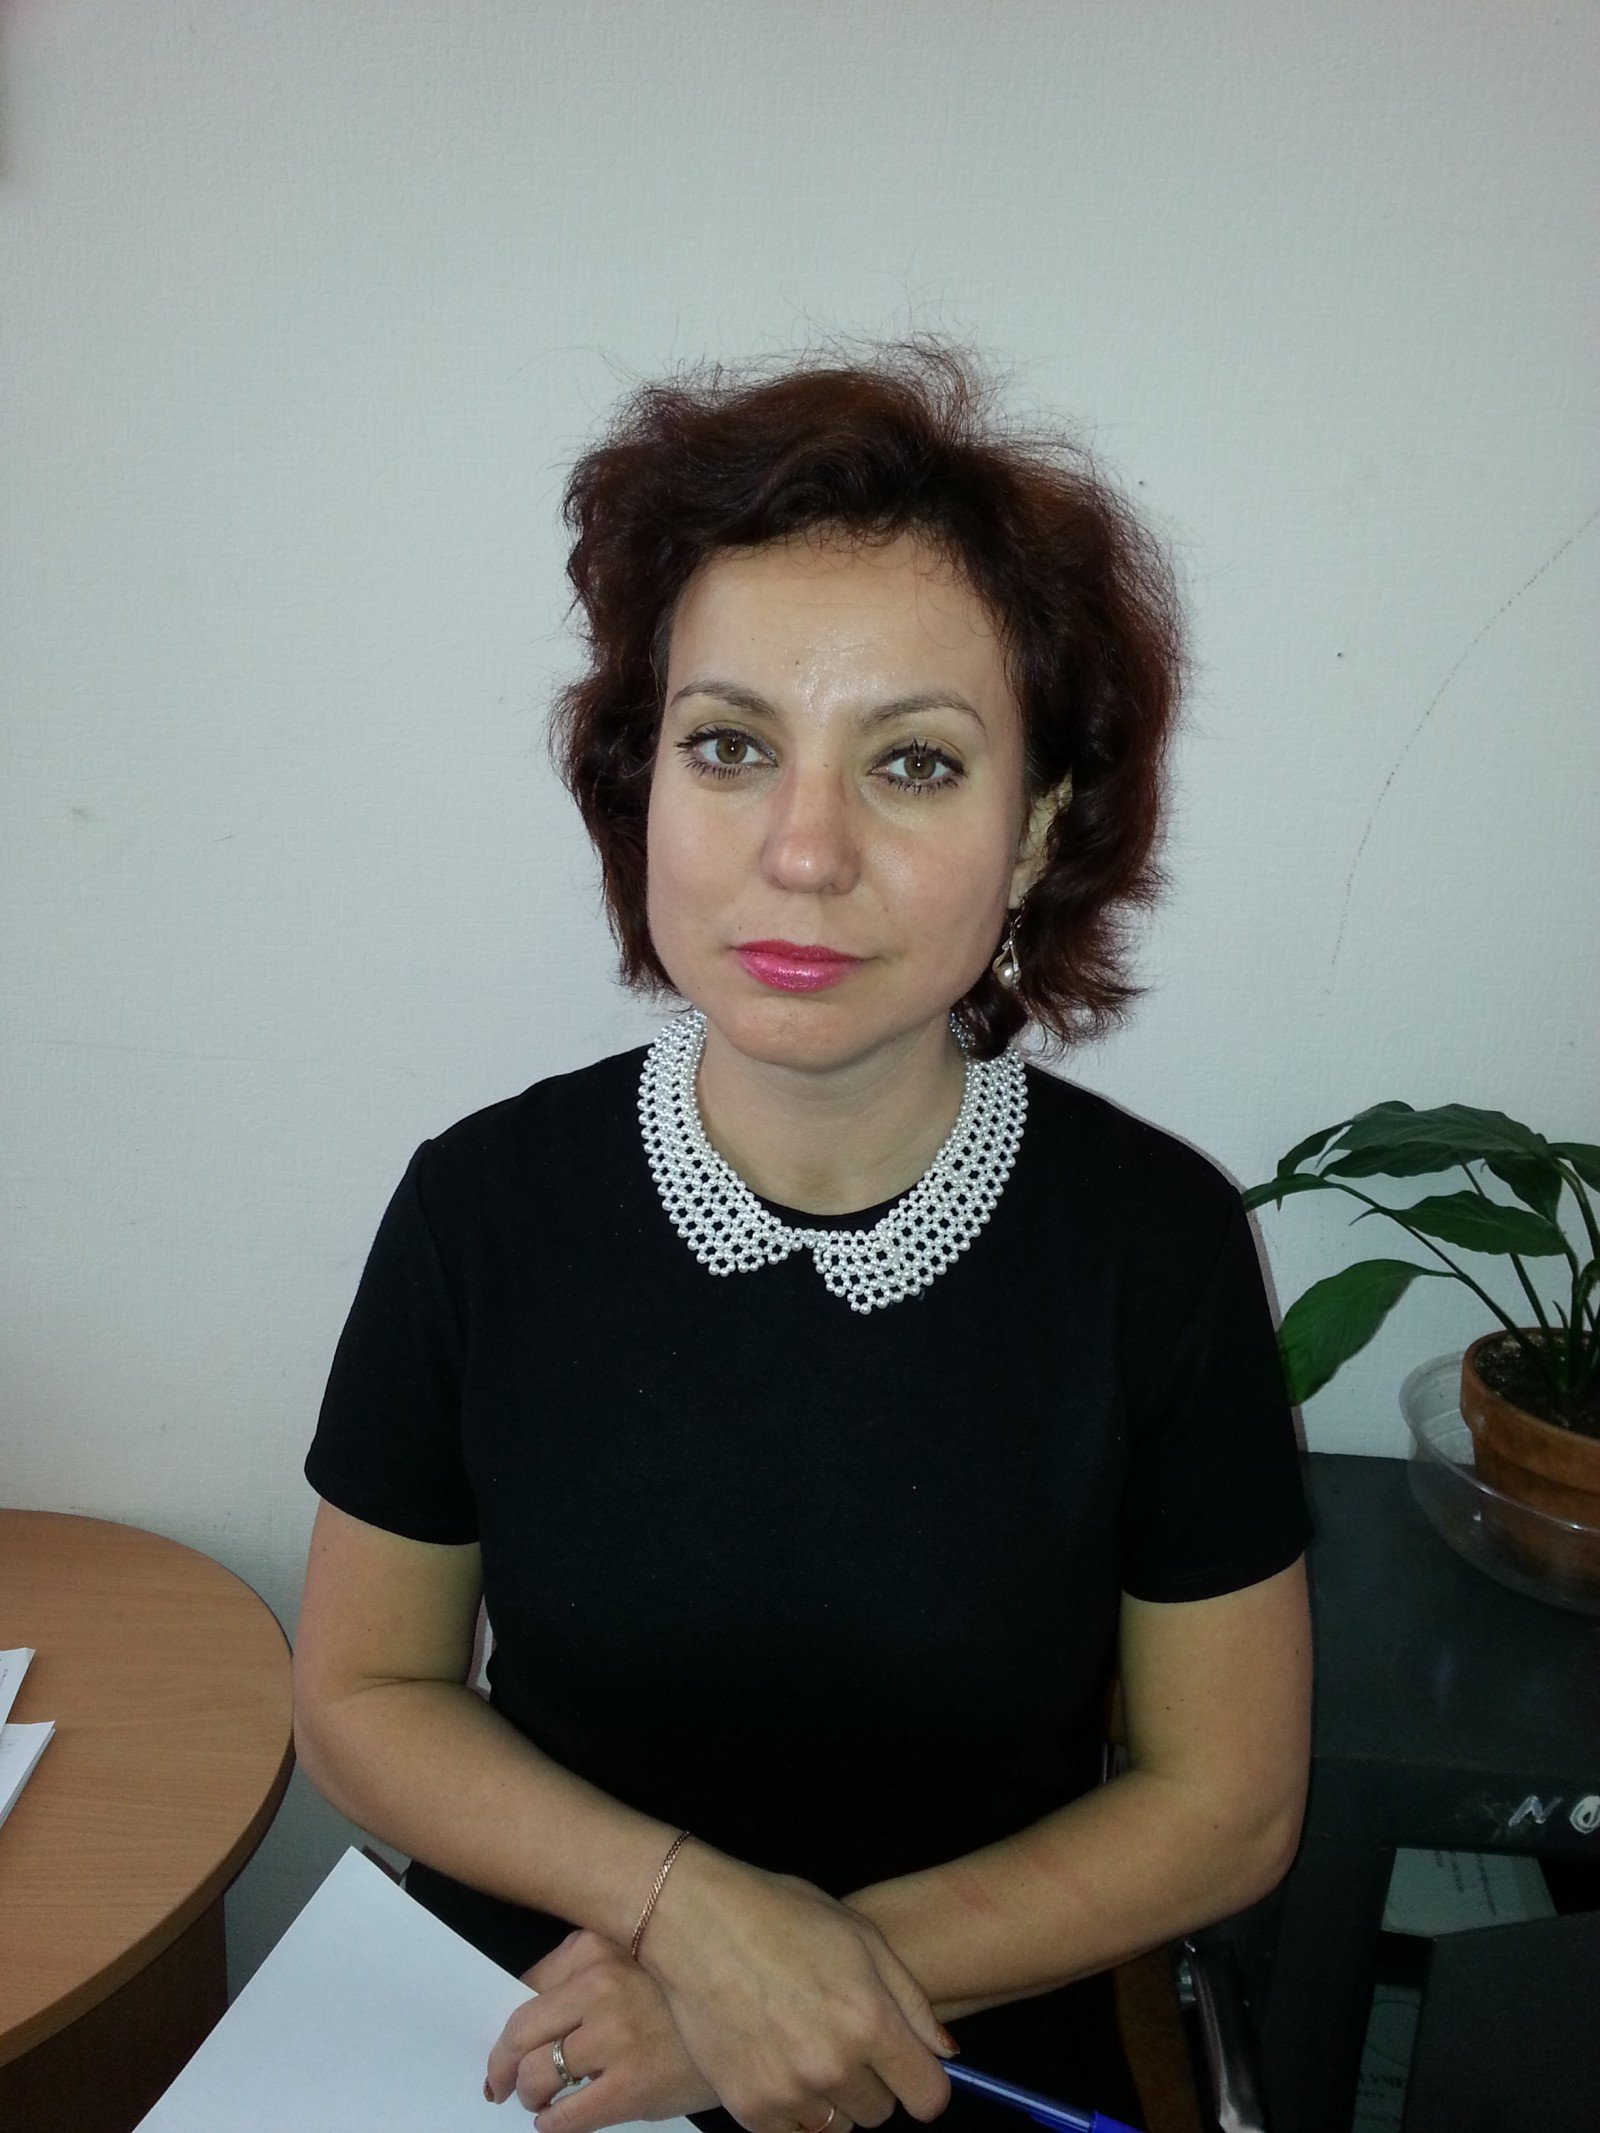 Кирьянова Дина Рафаэльевна